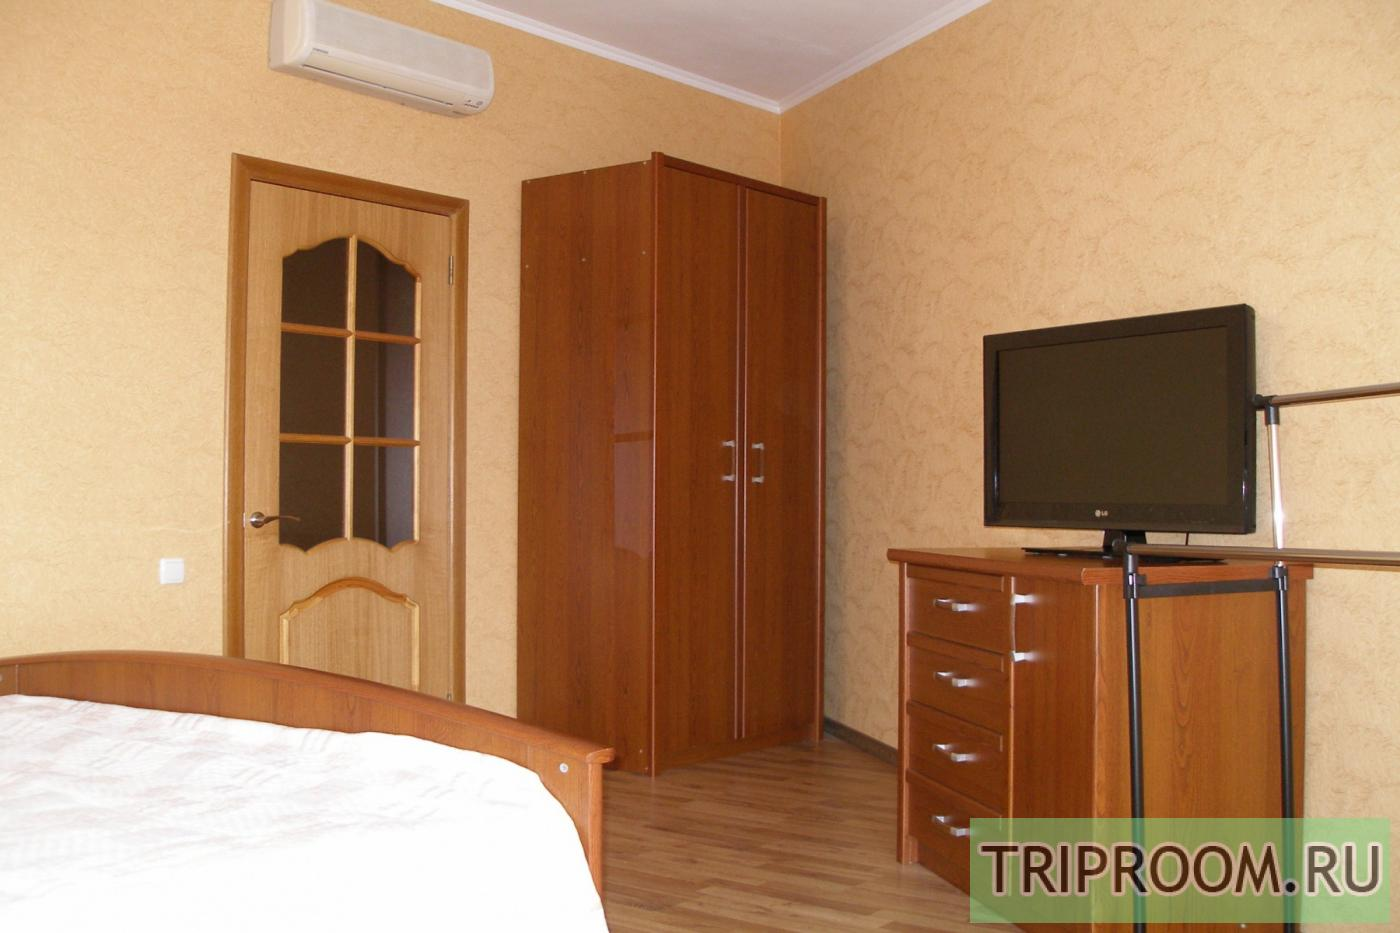 3-комнатная квартира посуточно (вариант № 34537), ул. Чехова улица, фото № 7